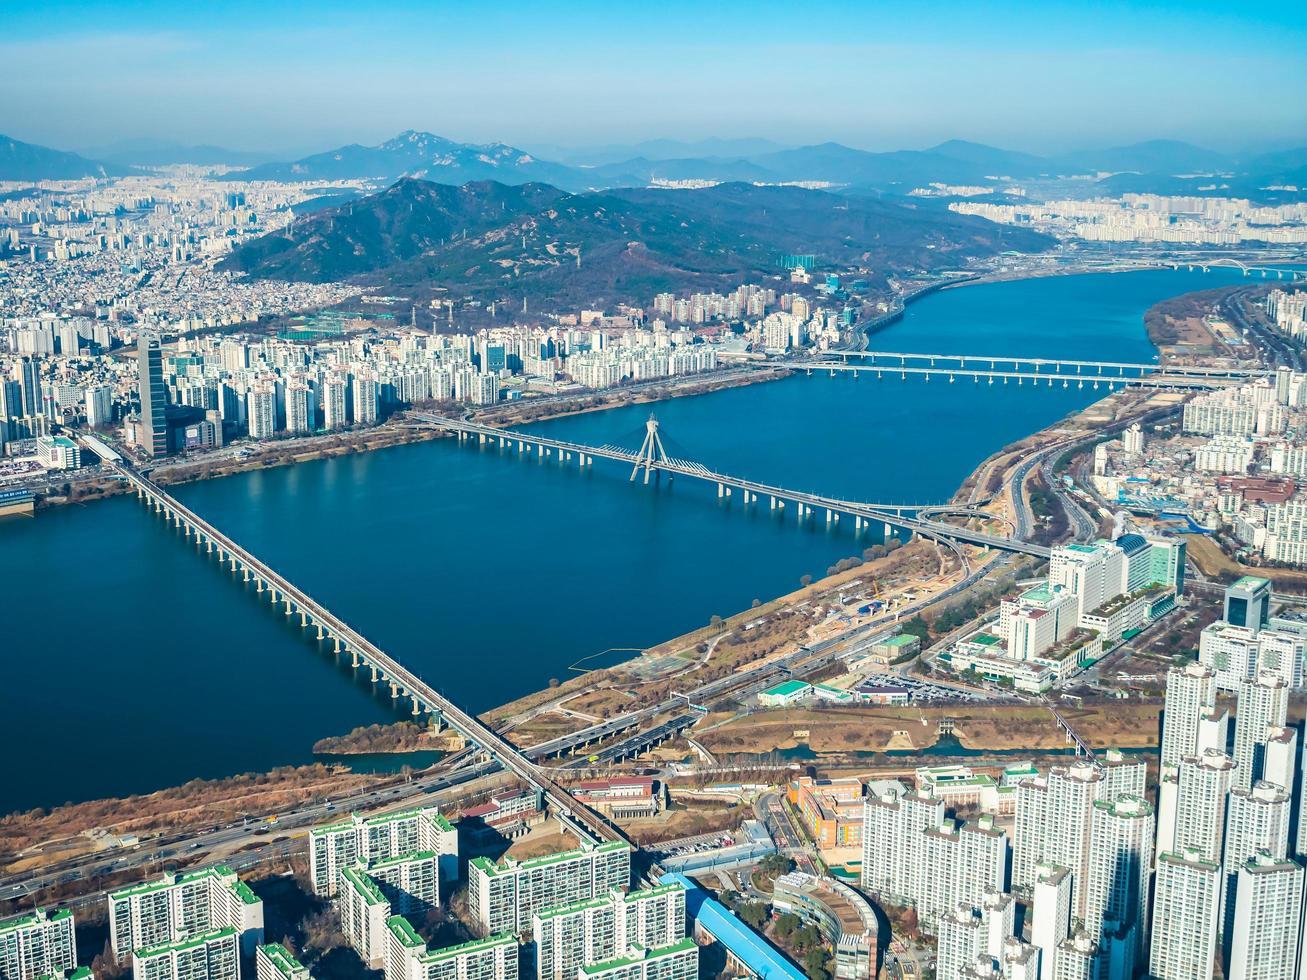 Flygfoto över staden Seoul, Sydkorea foto